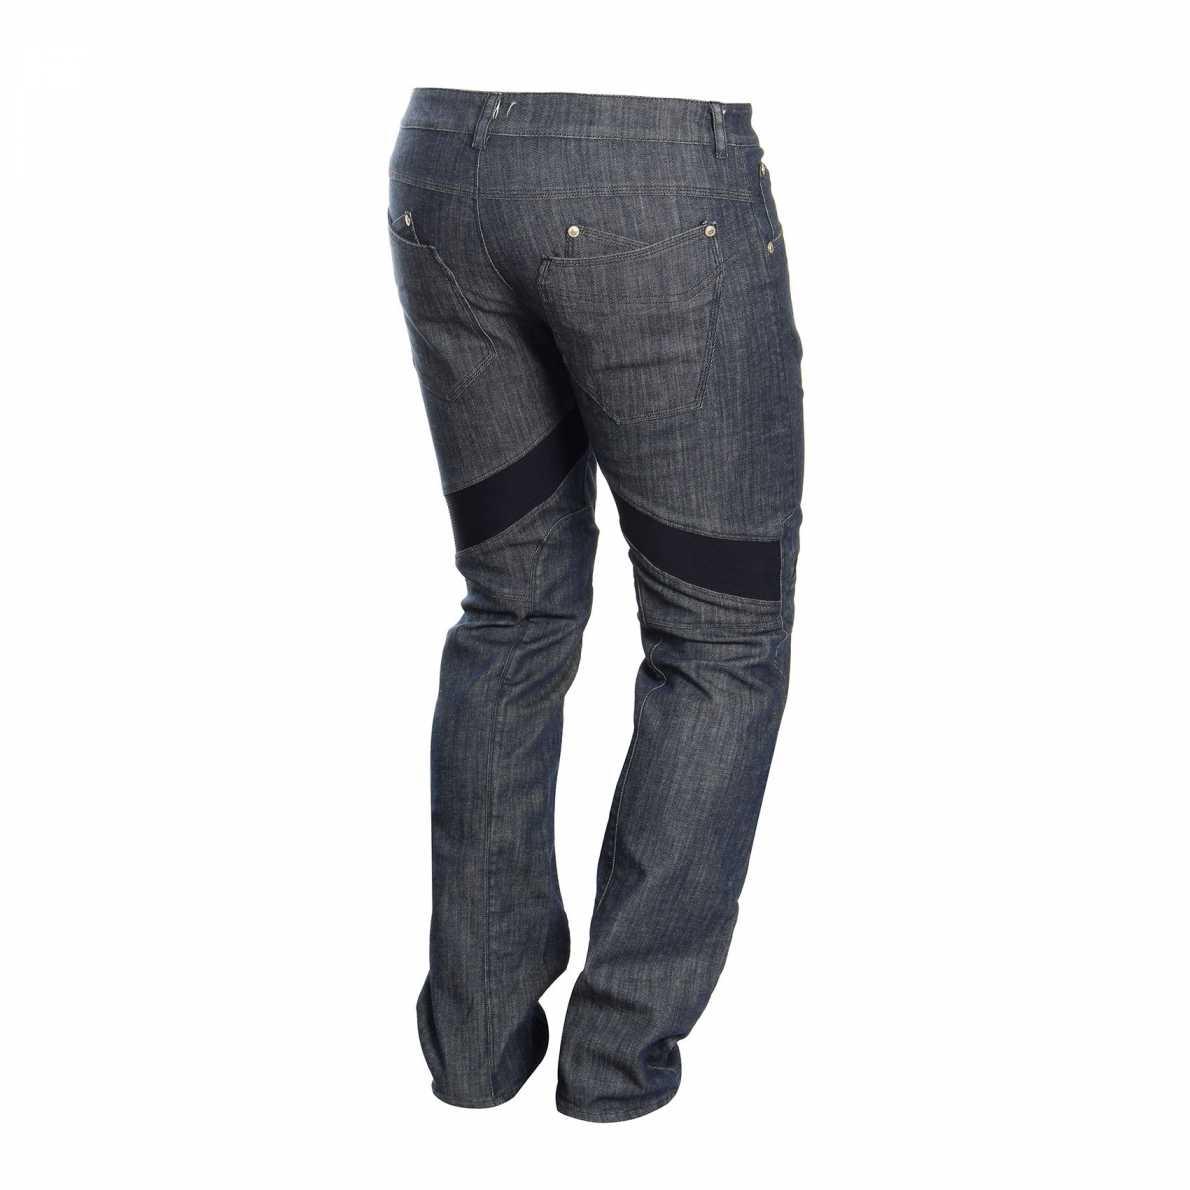 pantalon moto cross taille 48. Black Bedroom Furniture Sets. Home Design Ideas